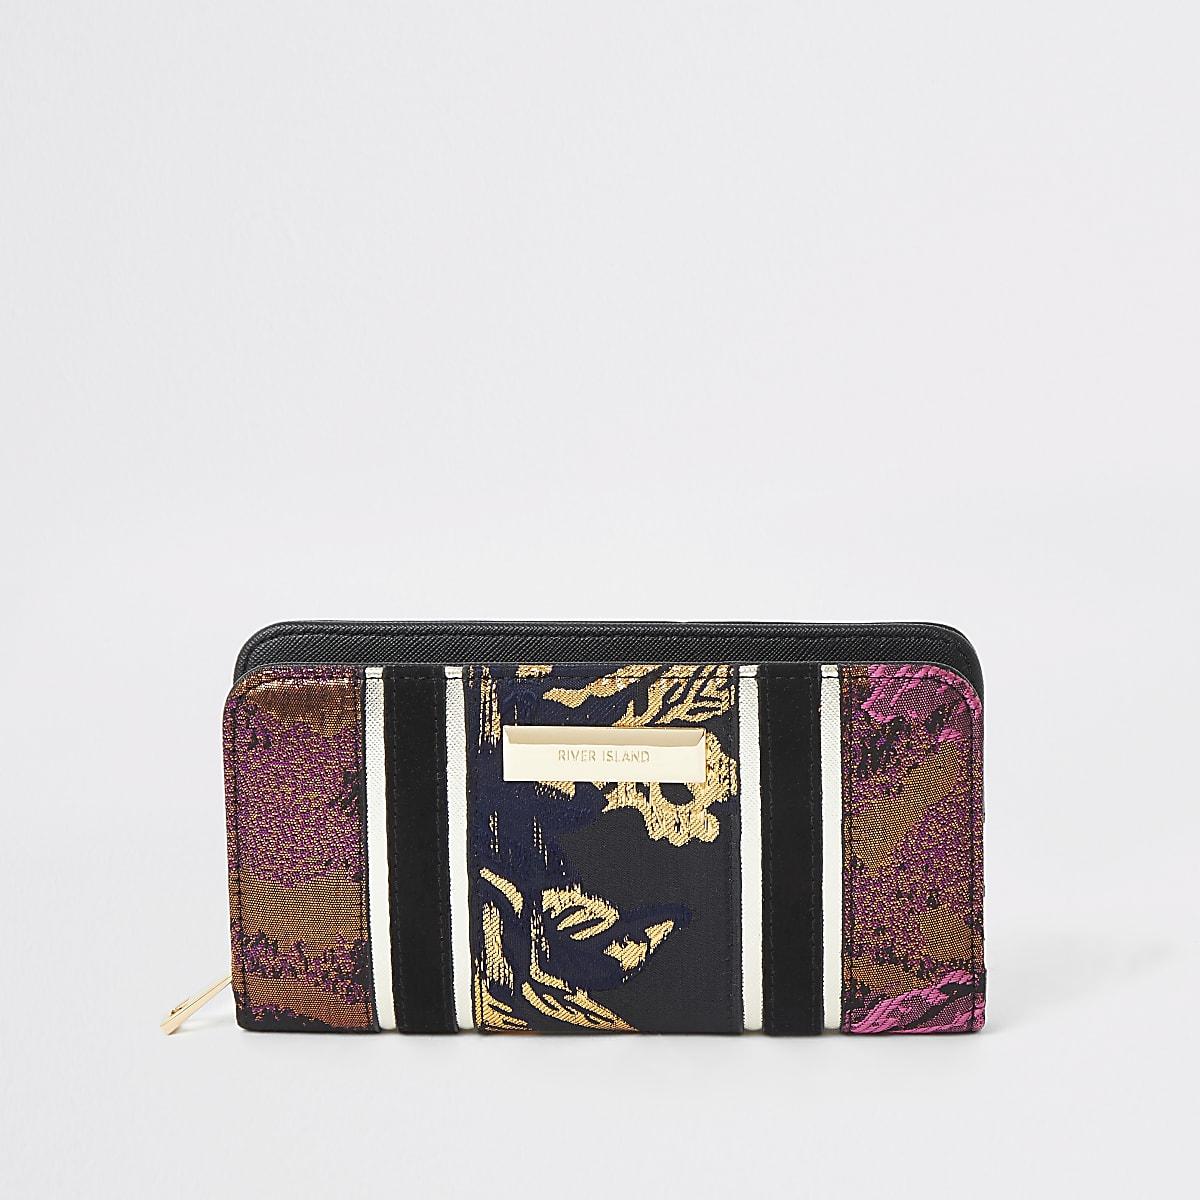 Zwarte portemonnee met rits rondom en jacquardprint